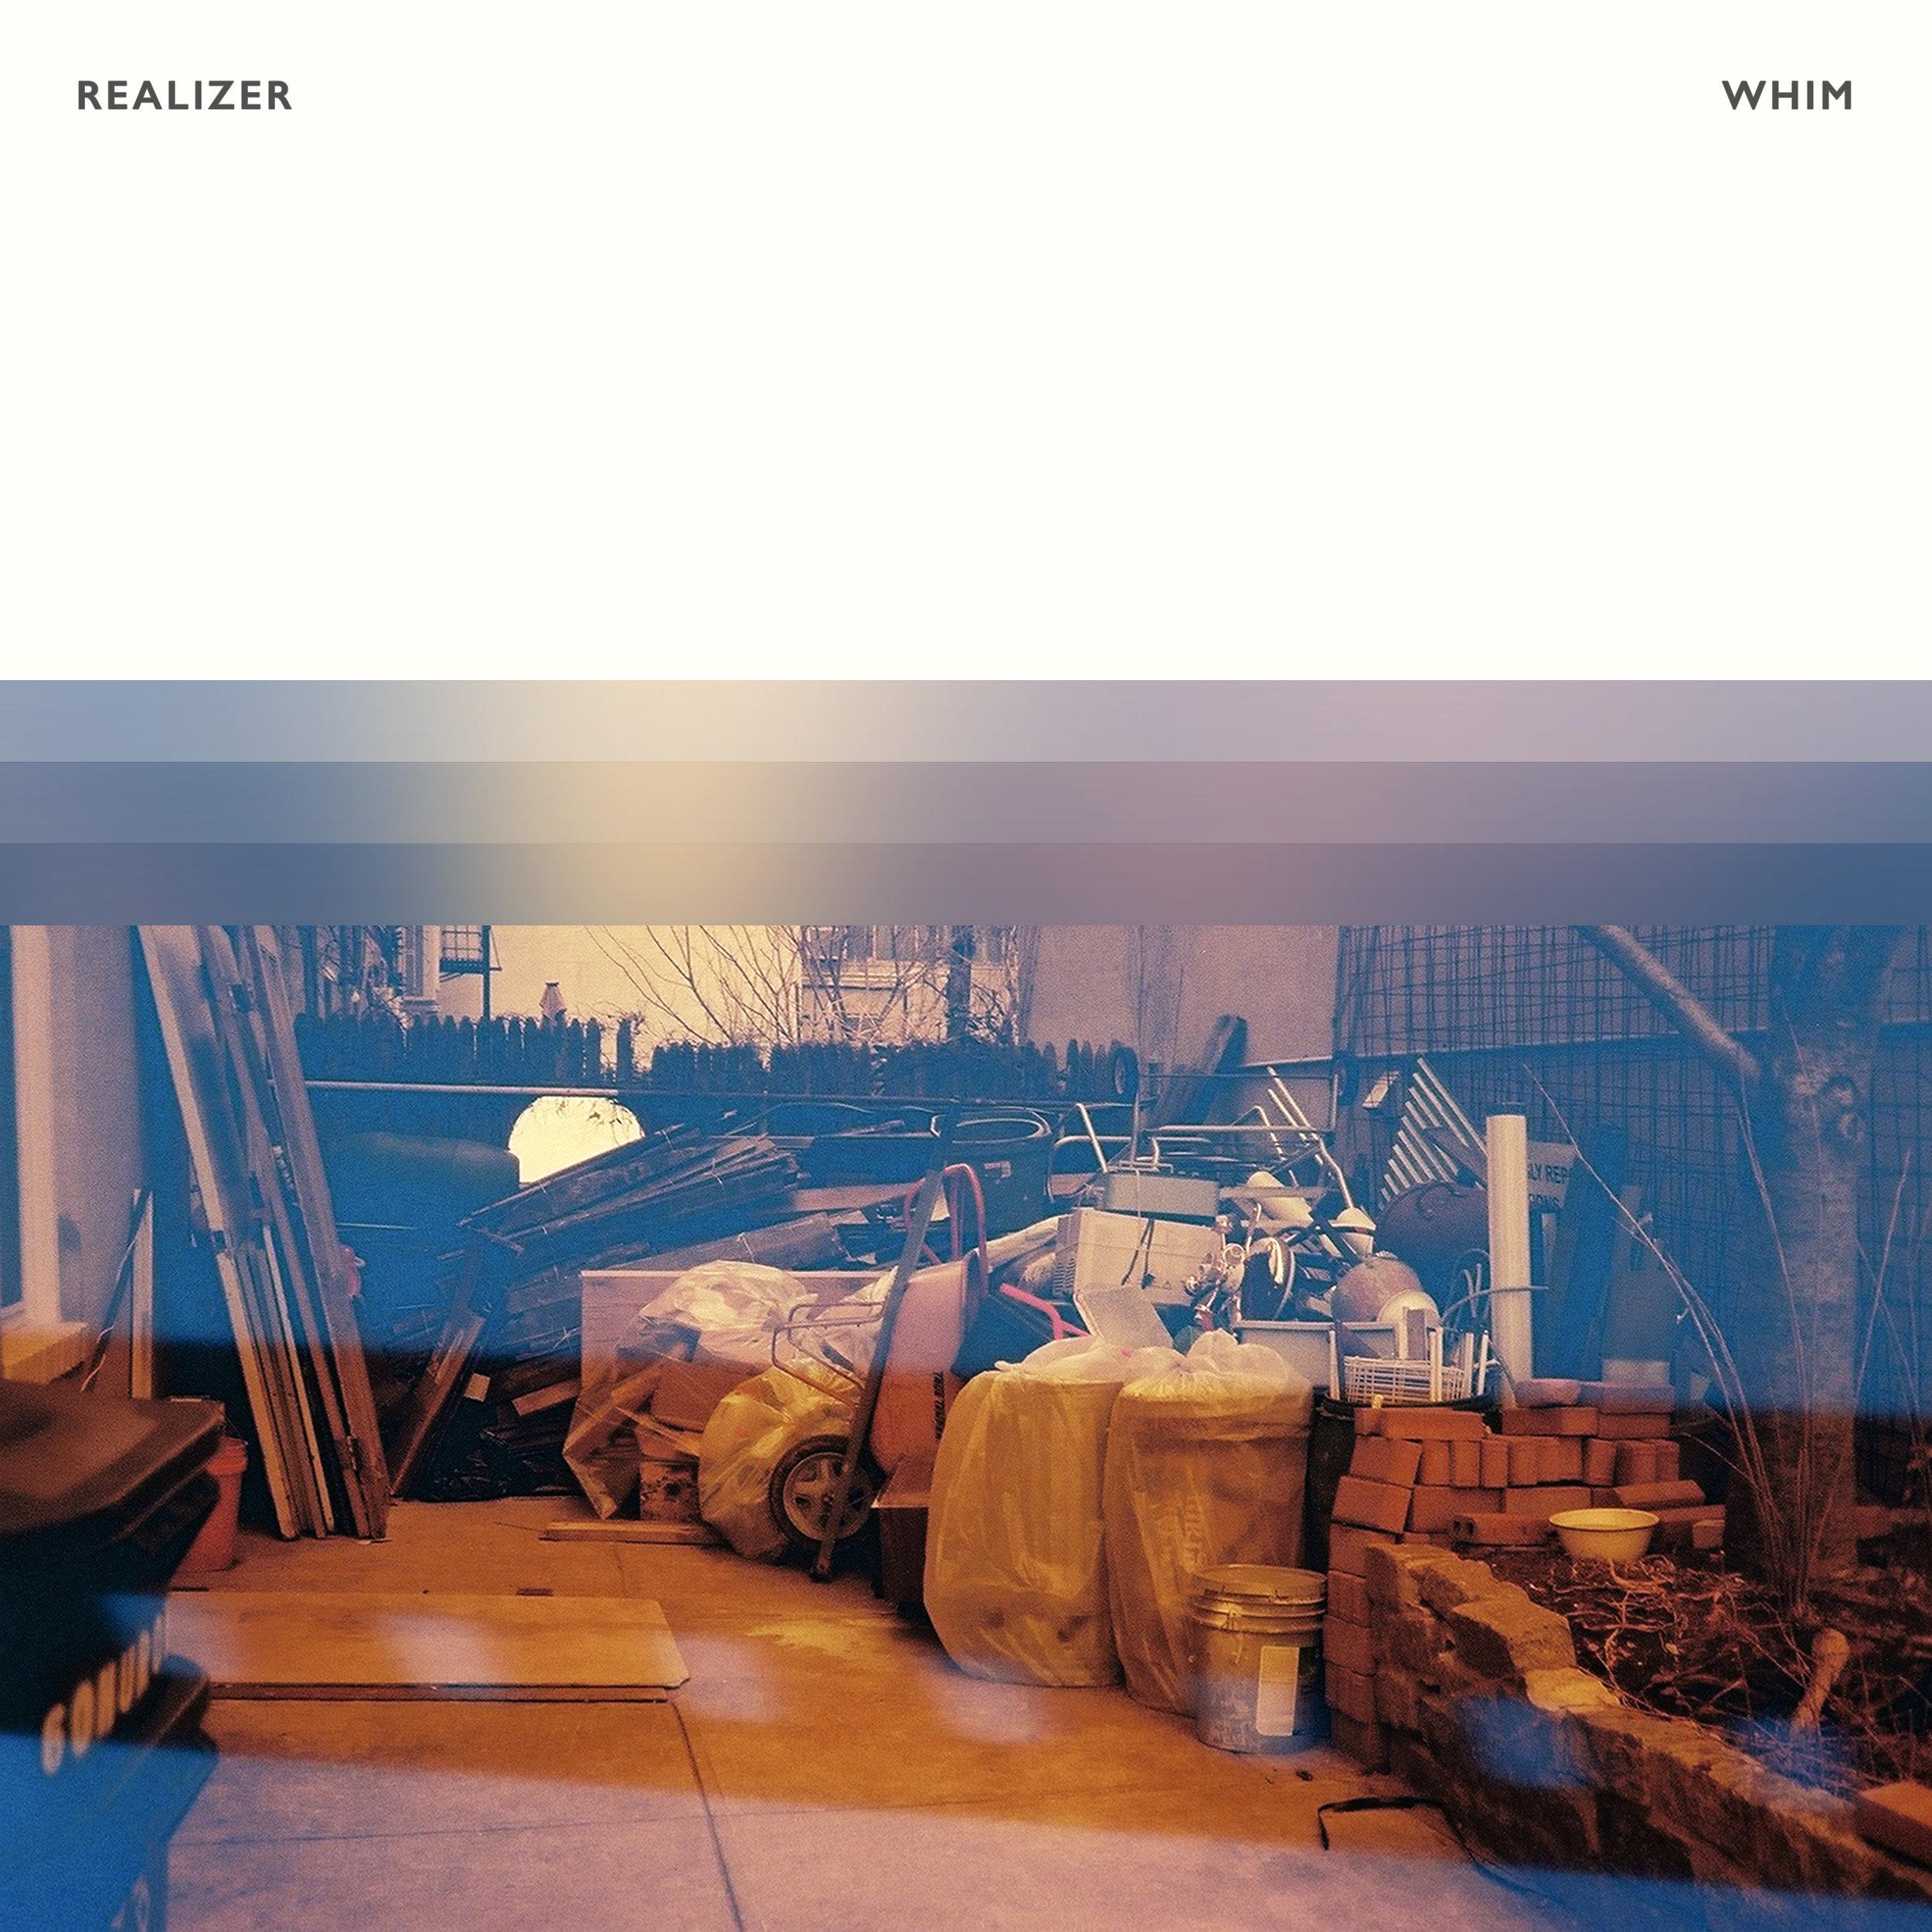 Realizer - Whim